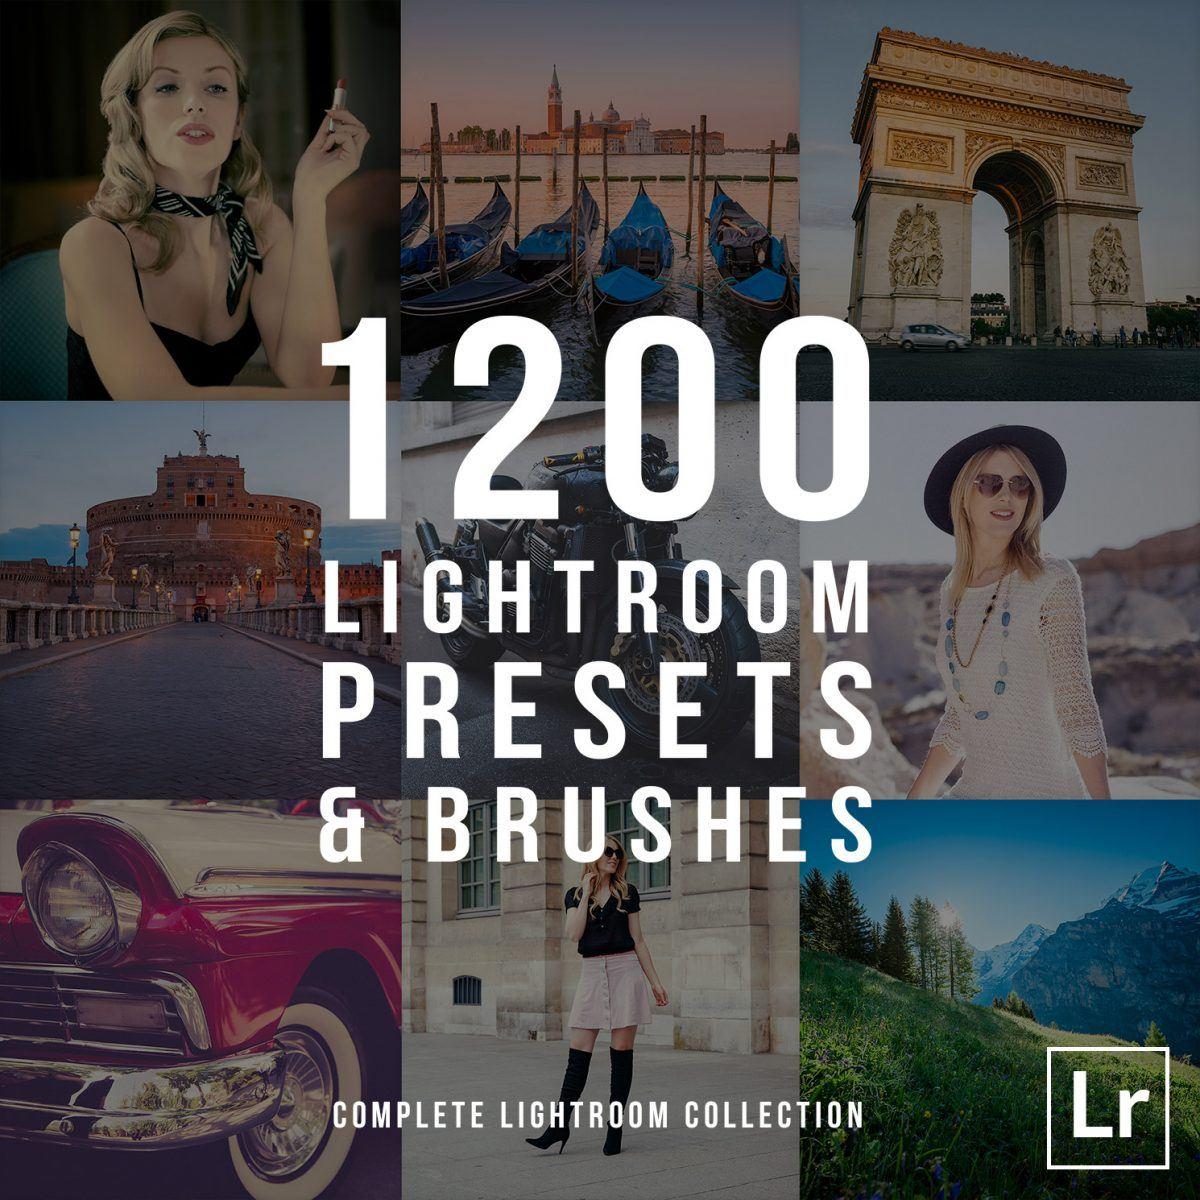 Presetpro-Beautiful-Lightroom-Presets-Brushes Creative Flow Presetpro.com